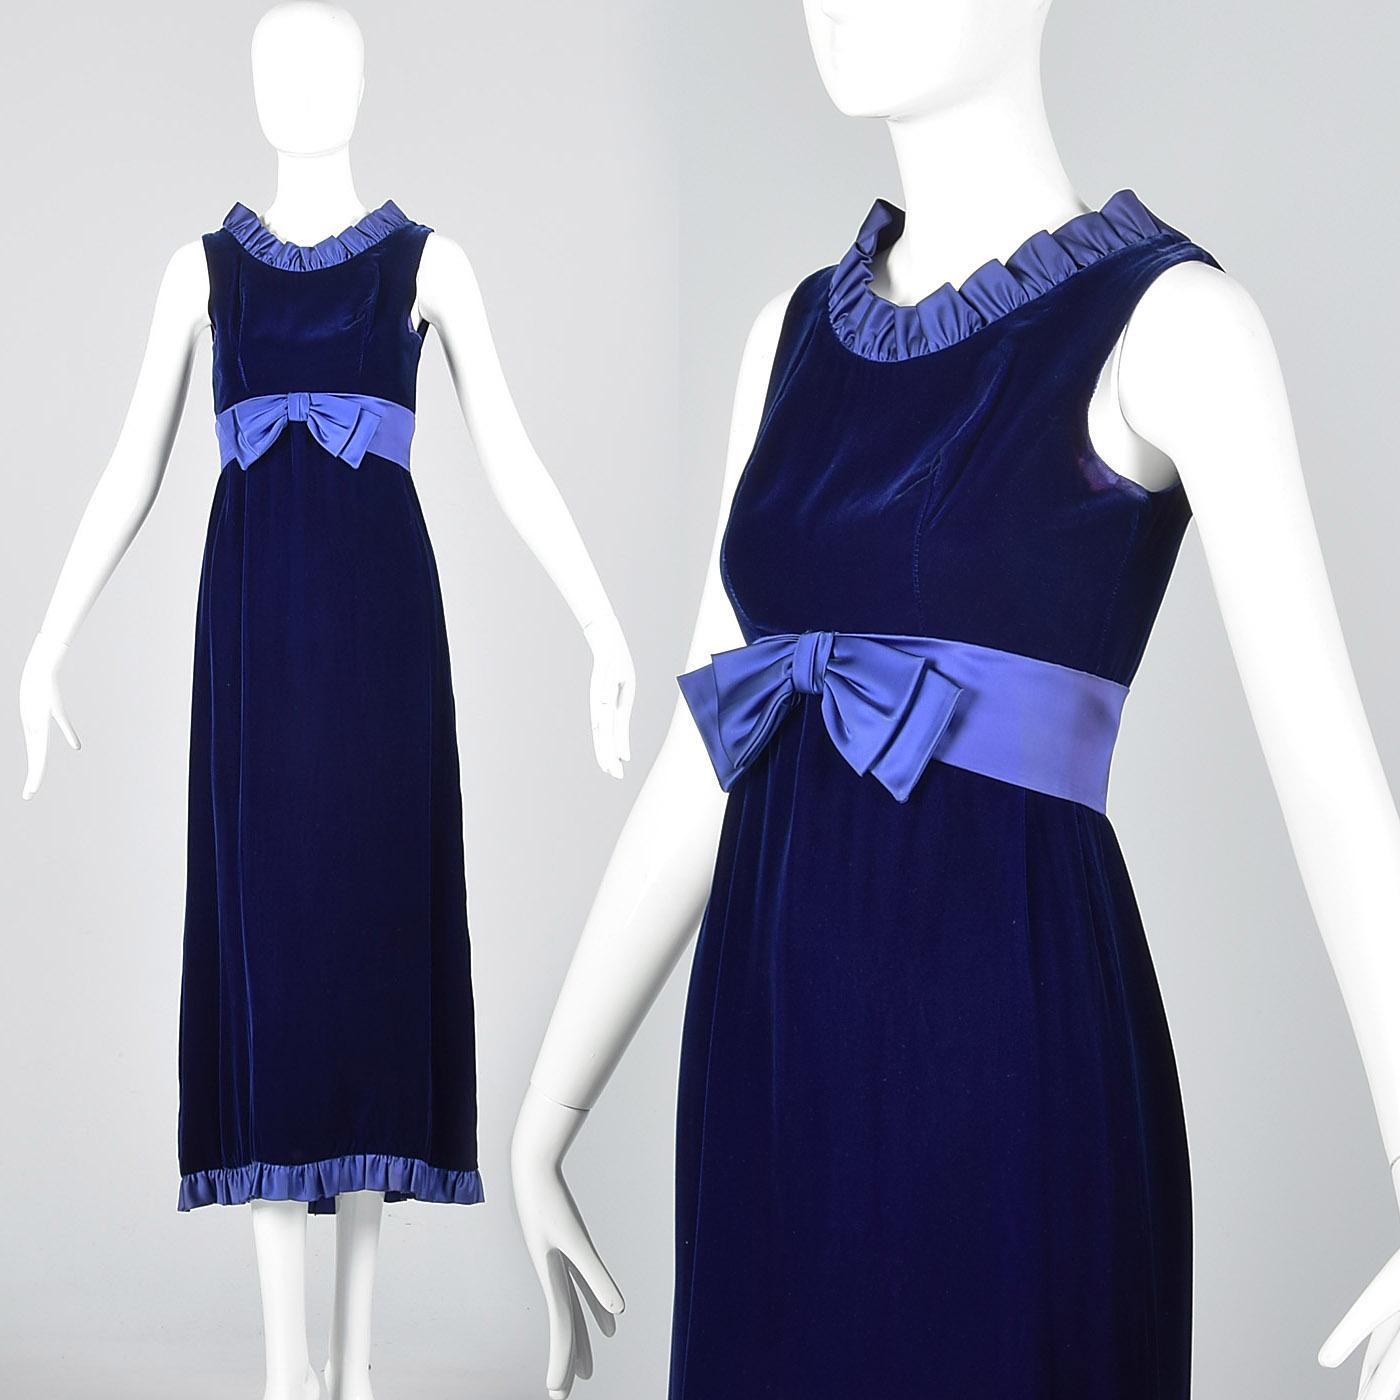 Vintage 1960s Prom Dresses